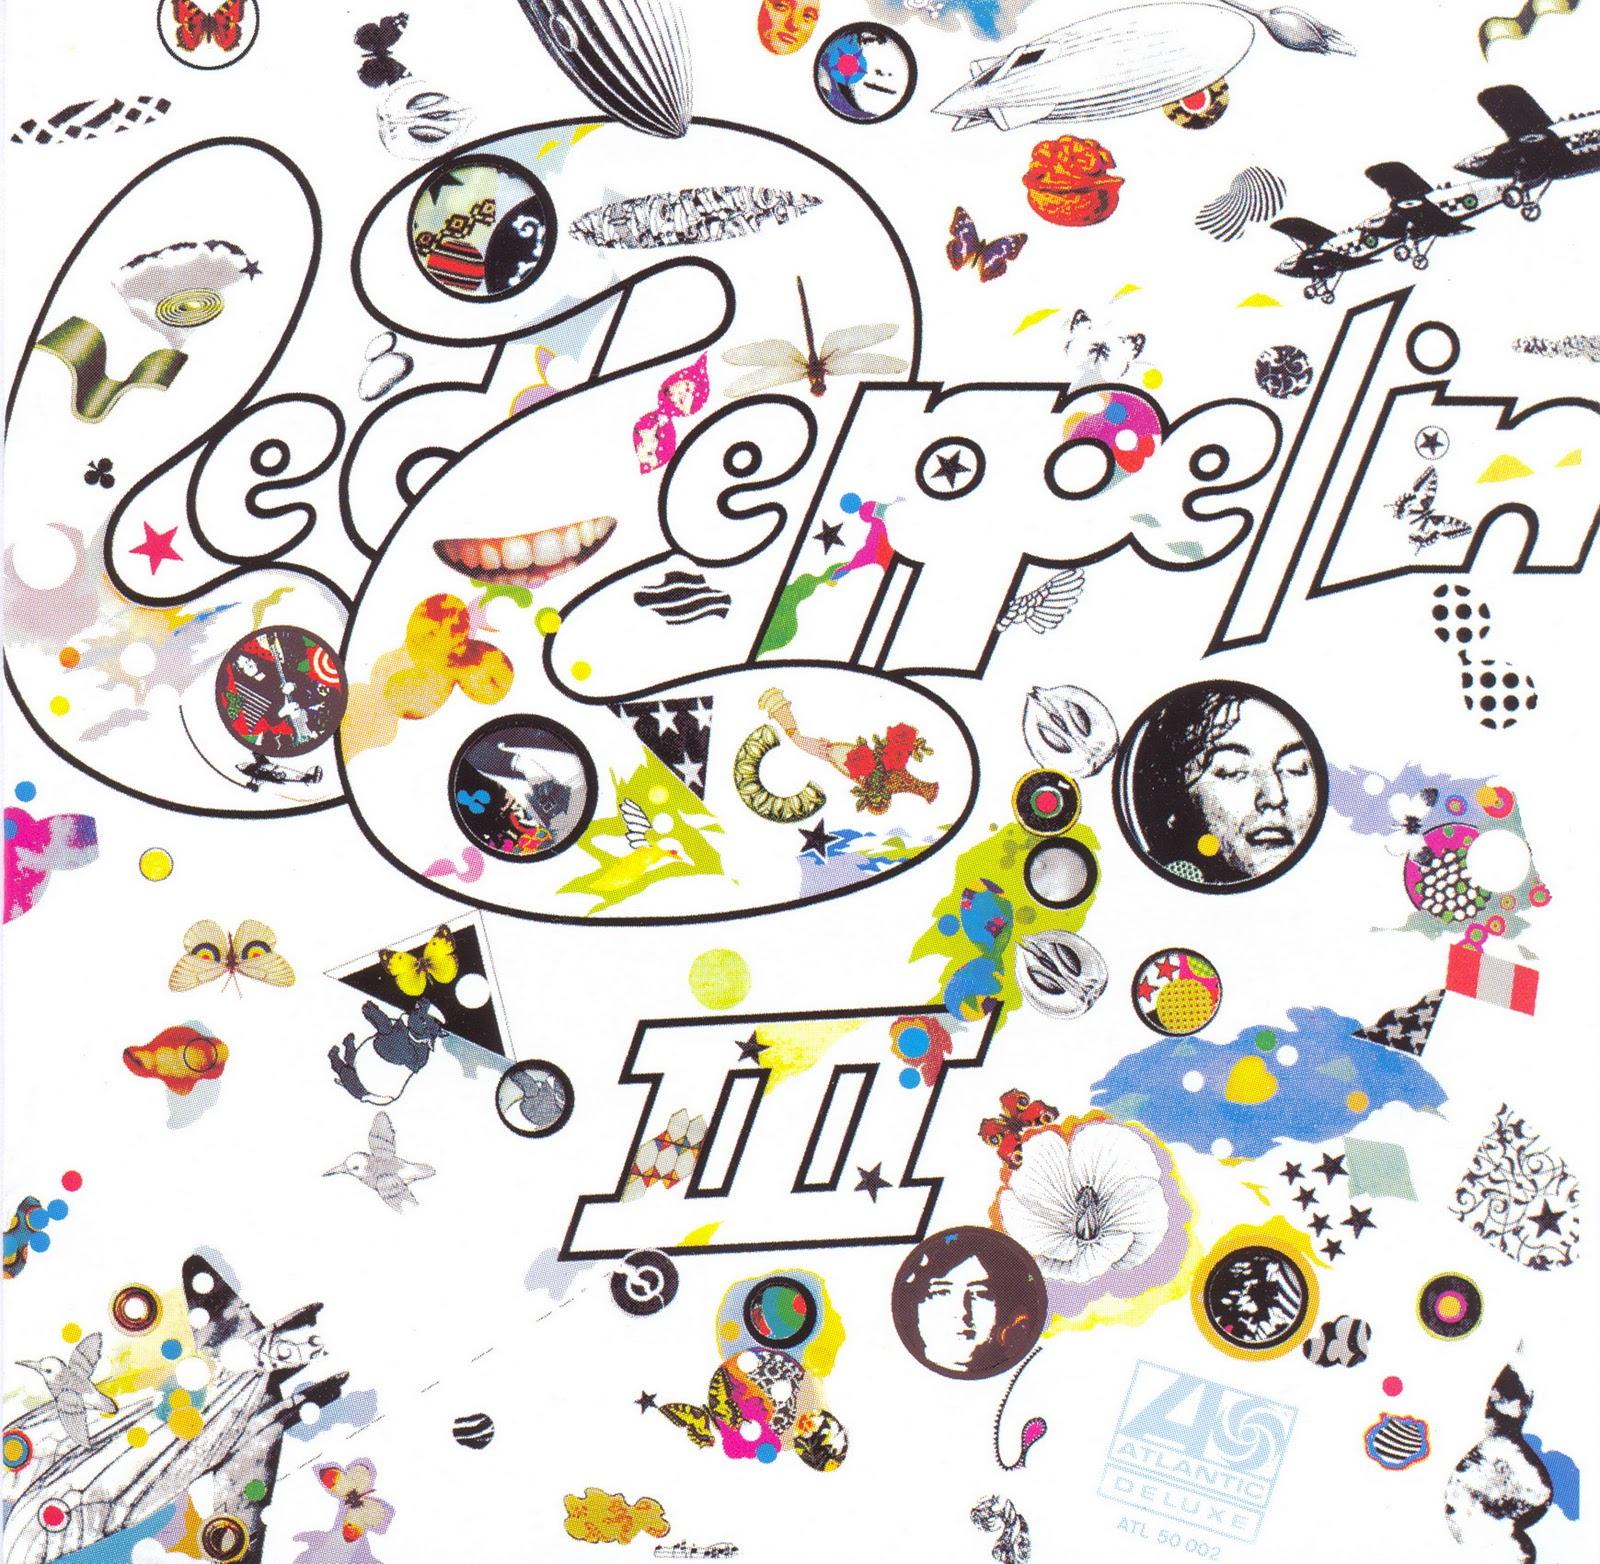 led zeppelin iii nice cover album CoS Readers Poll Results: Favorite Led Zeppelin Album